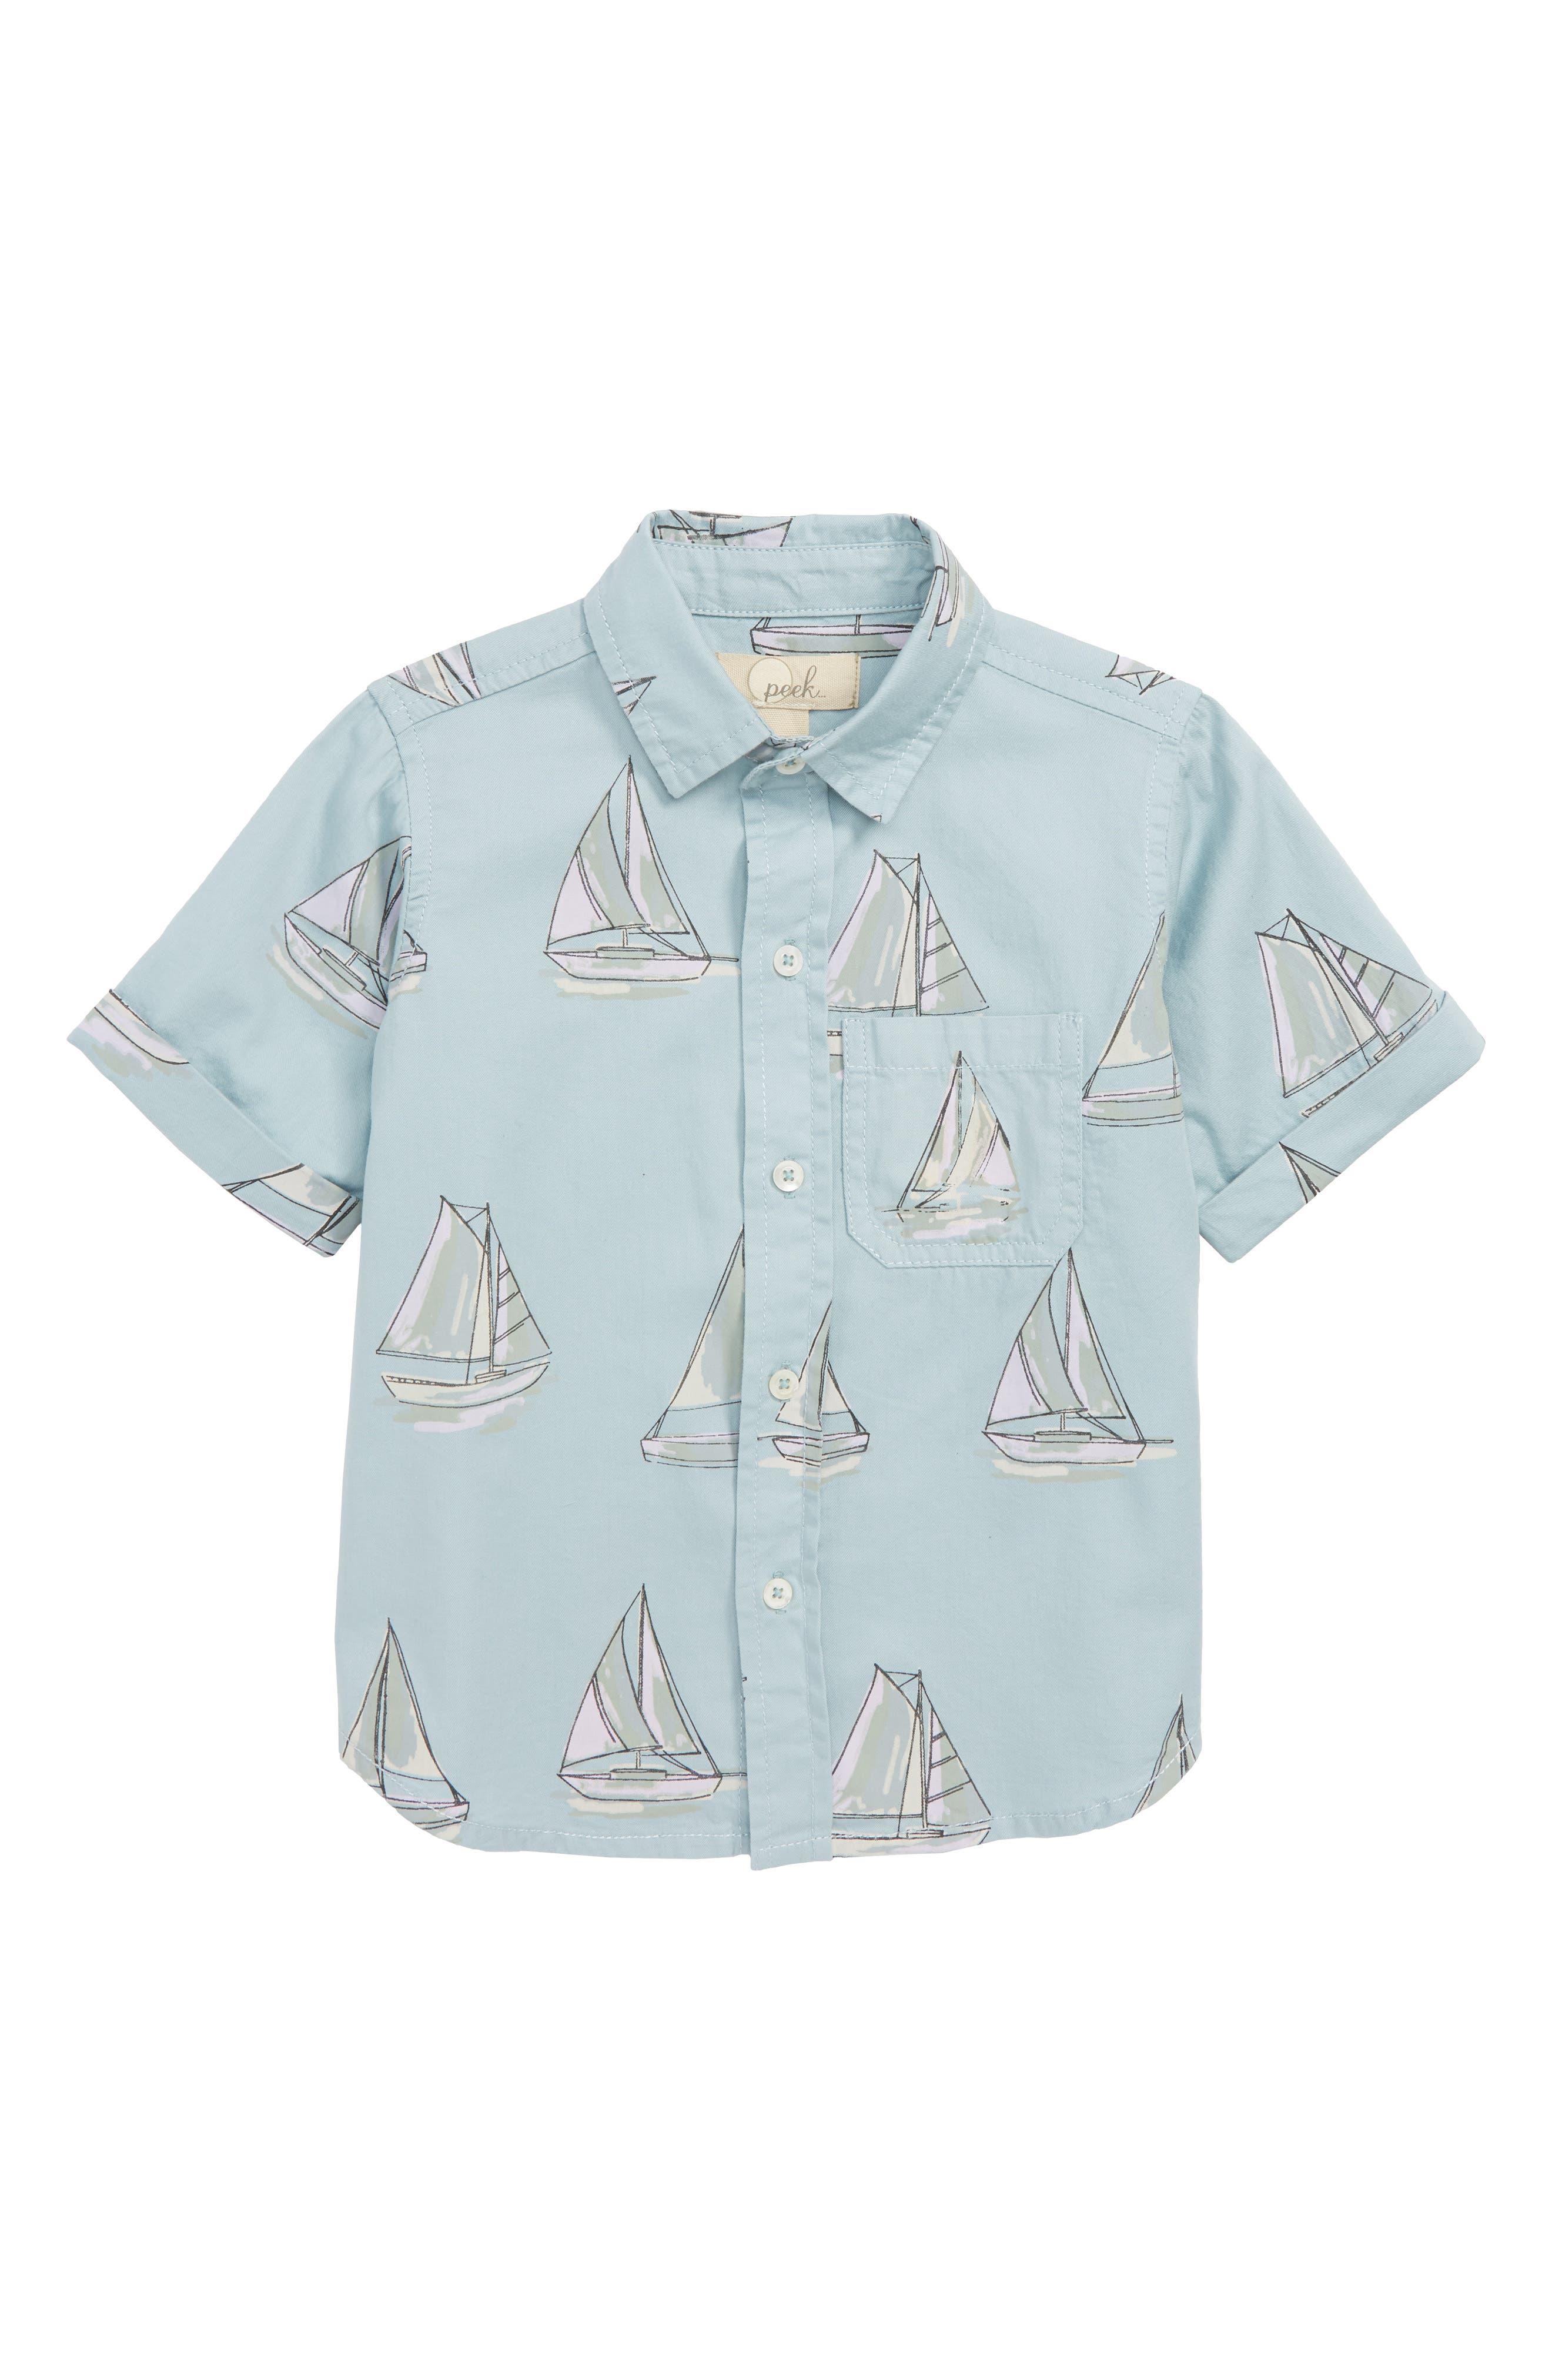 Peek Sailboat Shirt,                             Main thumbnail 1, color,                             400